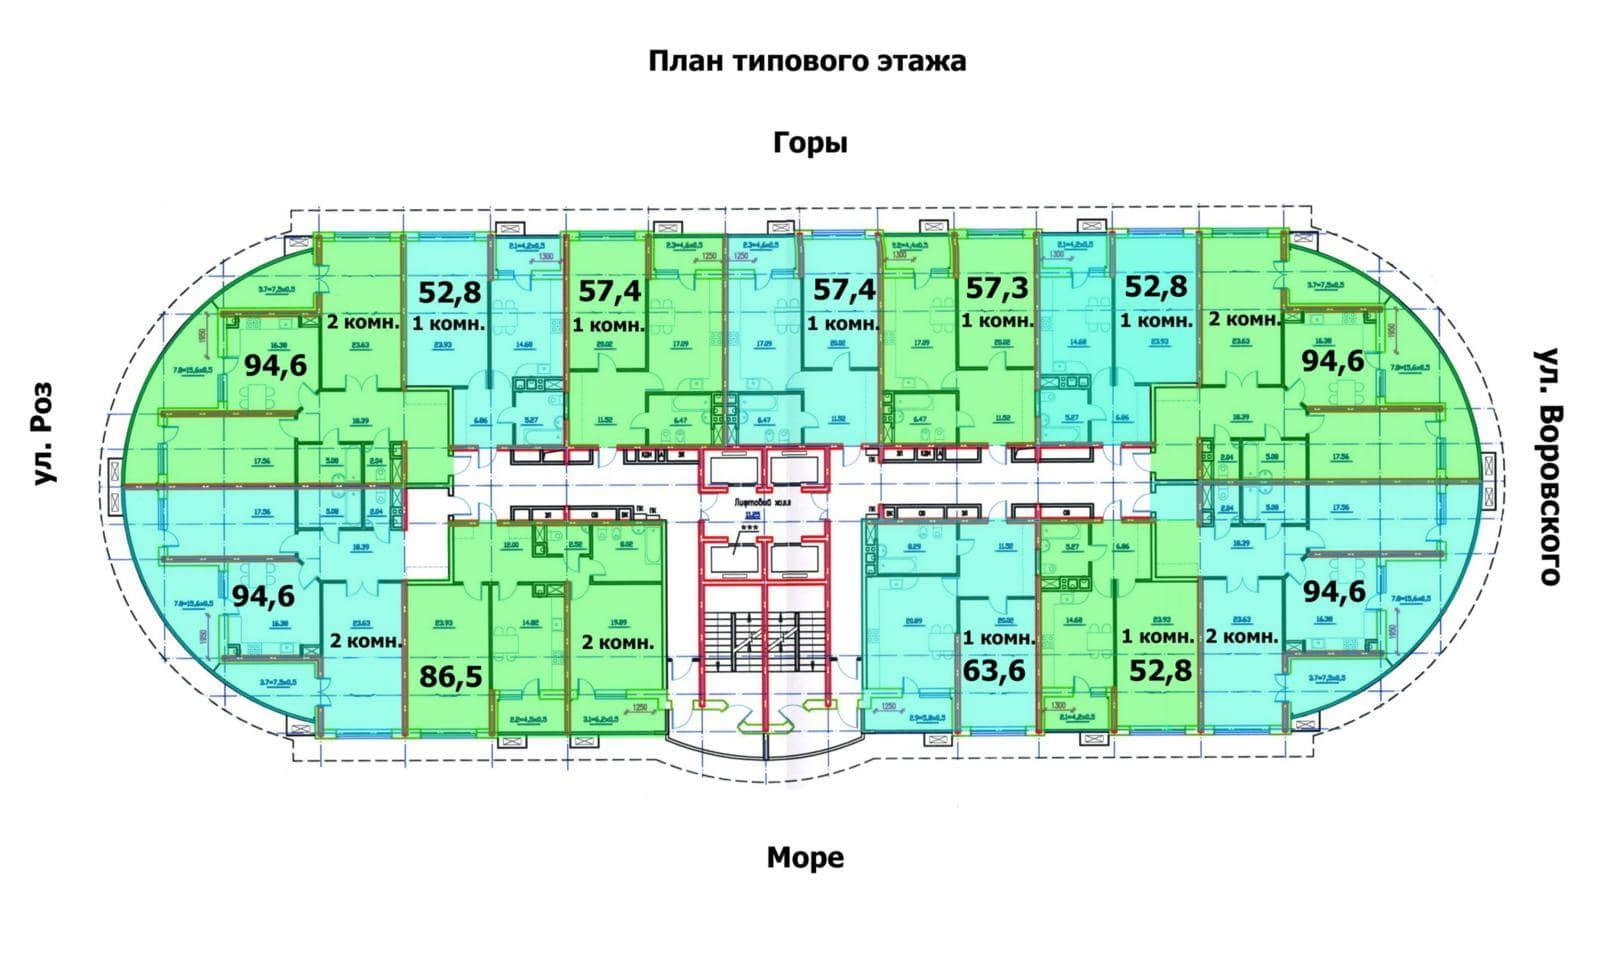 ЖК Олимпик плаза Типовой план этажа